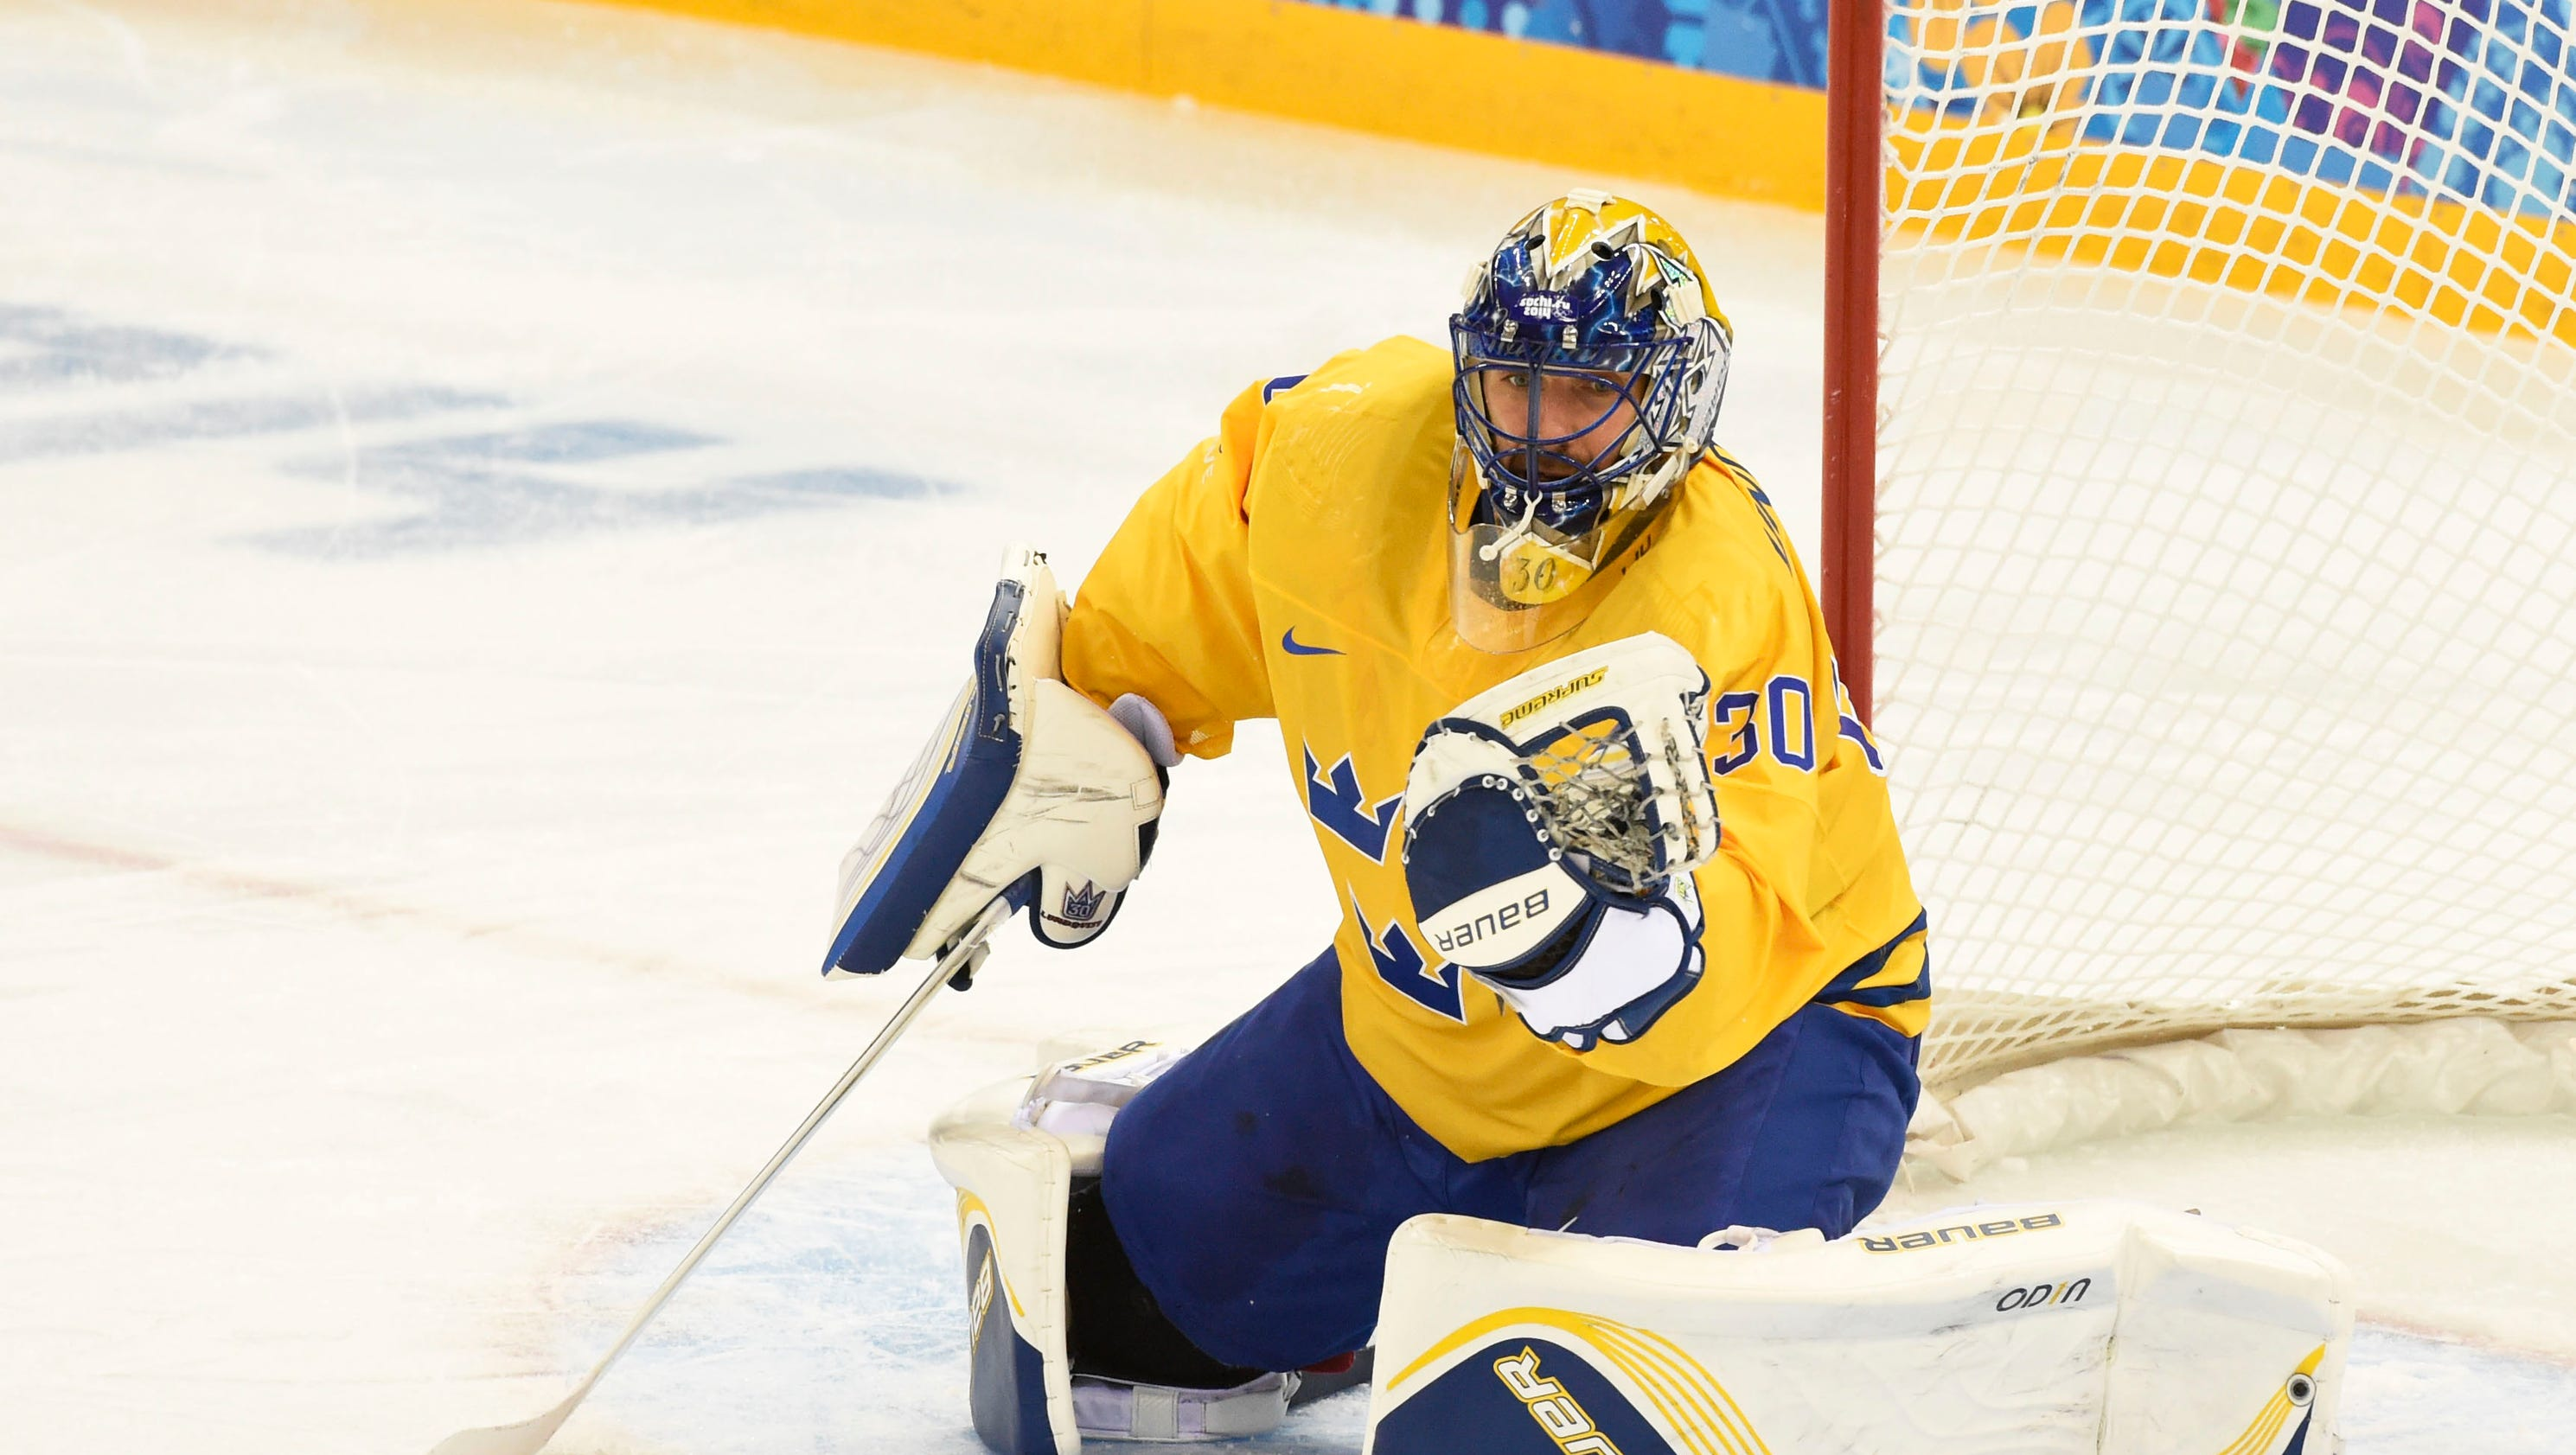 636268411741752070-usp-olympics-ice-hockey-men-s-prelim-round-swe-vs-62028402